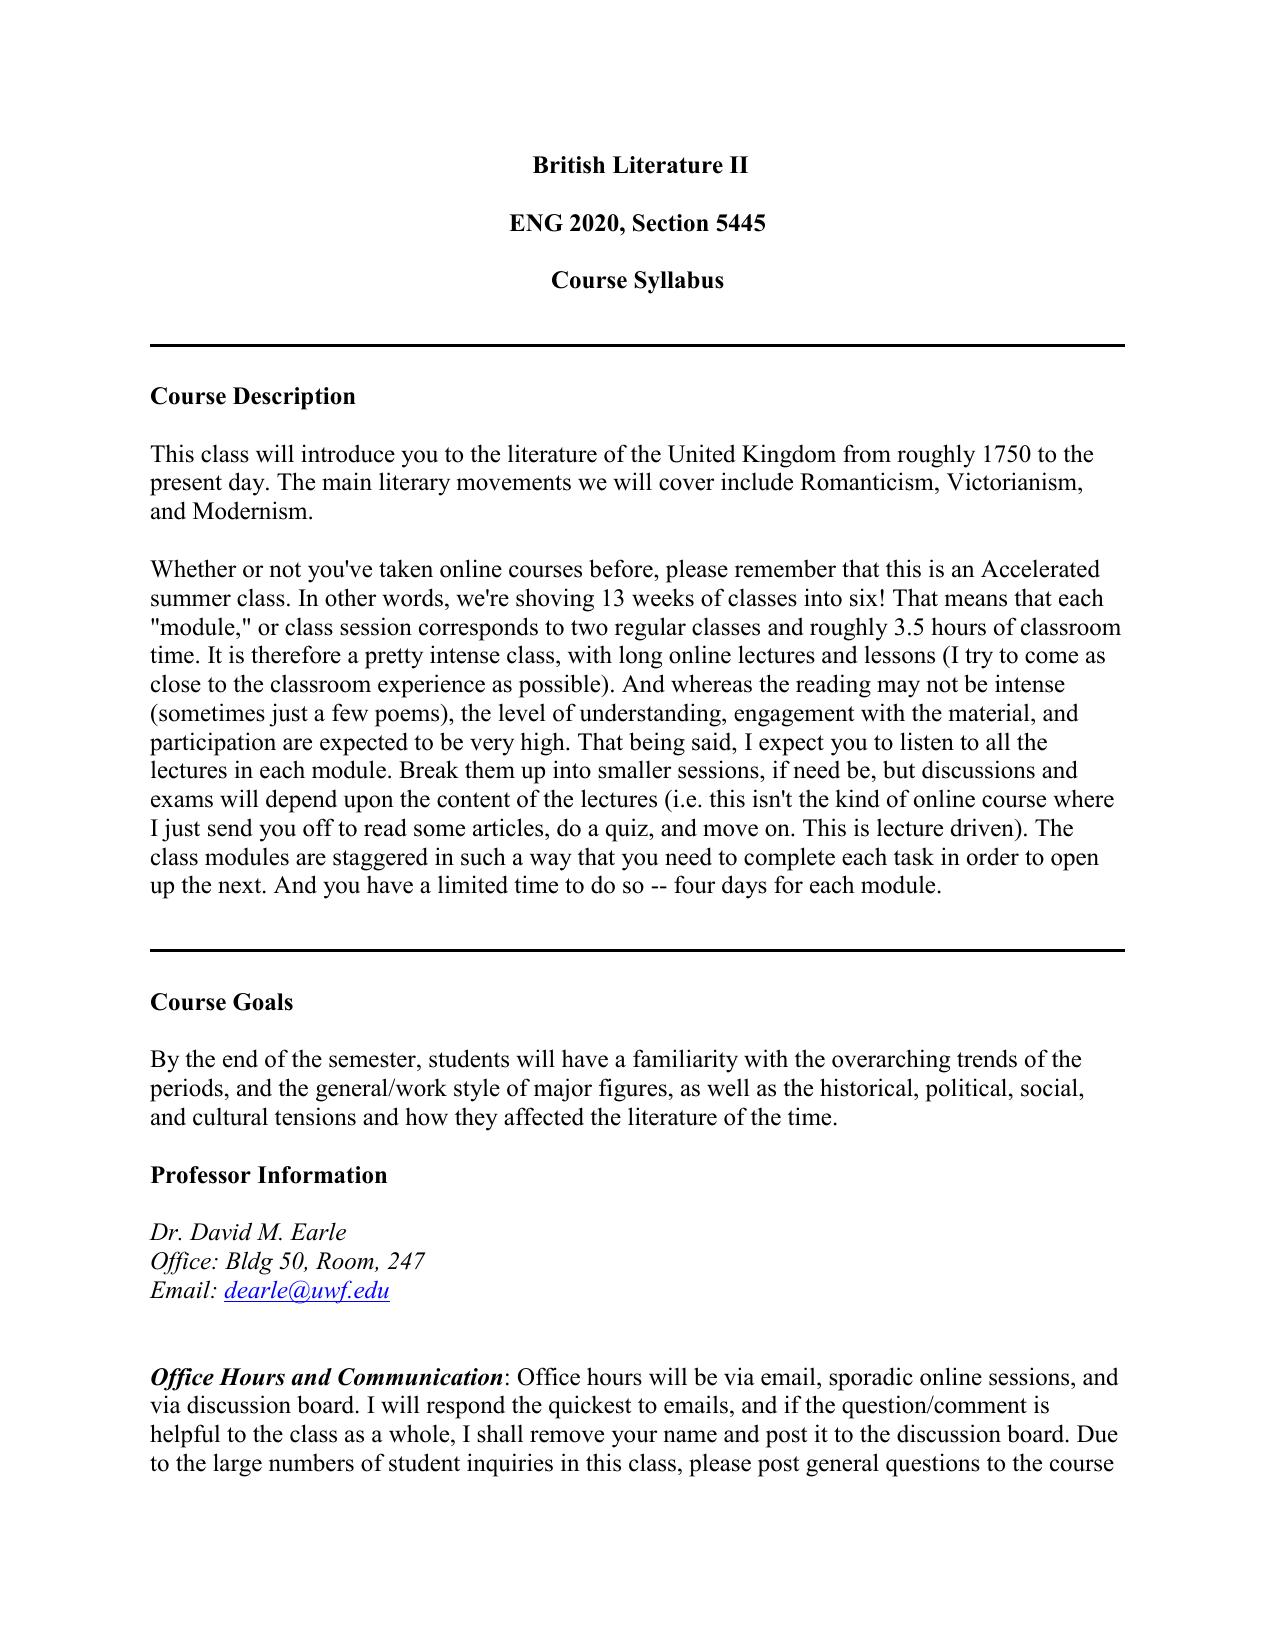 Uwf Spring Break 2020.British Literature Ii Eng 2020 Section 5445 Course Syllabus